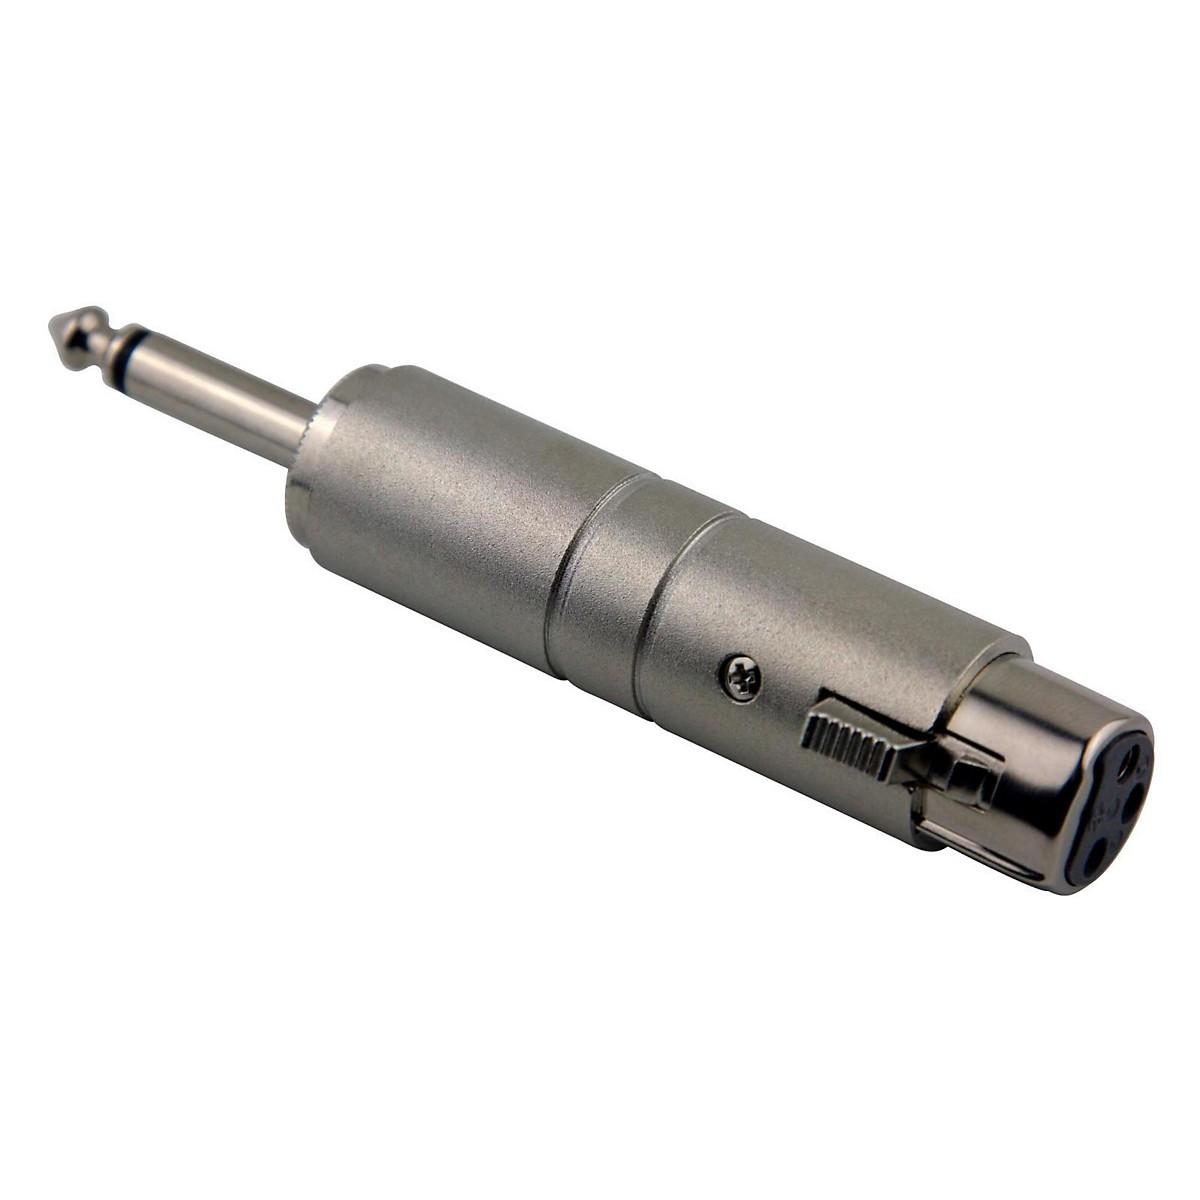 Pig Hog Solutions Line Transformer XLR(F) to 1/4